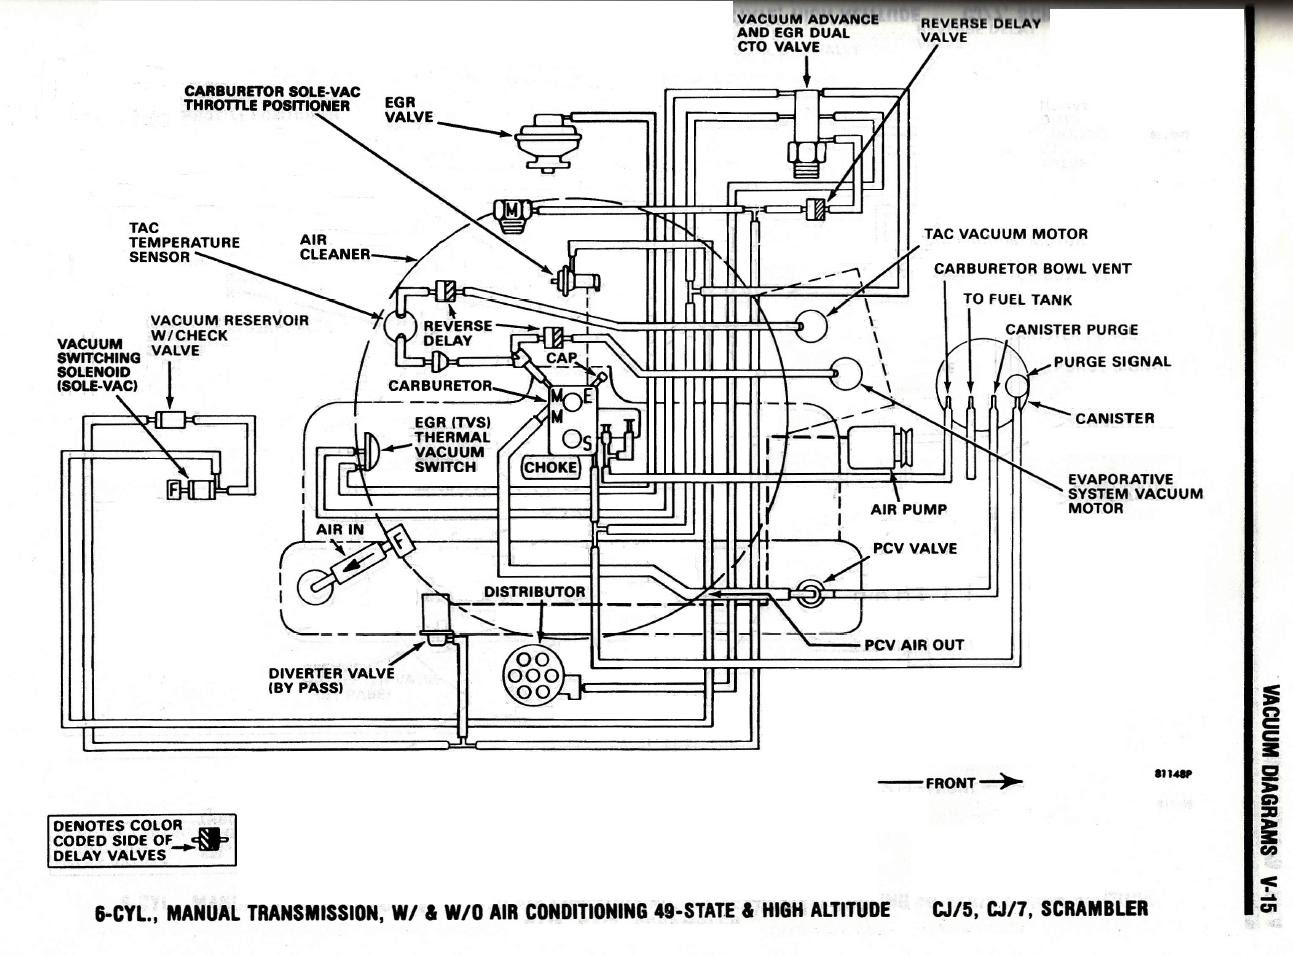 Diagram Jeep Cj Vacuum Diagram Full Version Hd Quality Vacuum Diagram Diagrambadenh Abacusfirenze It